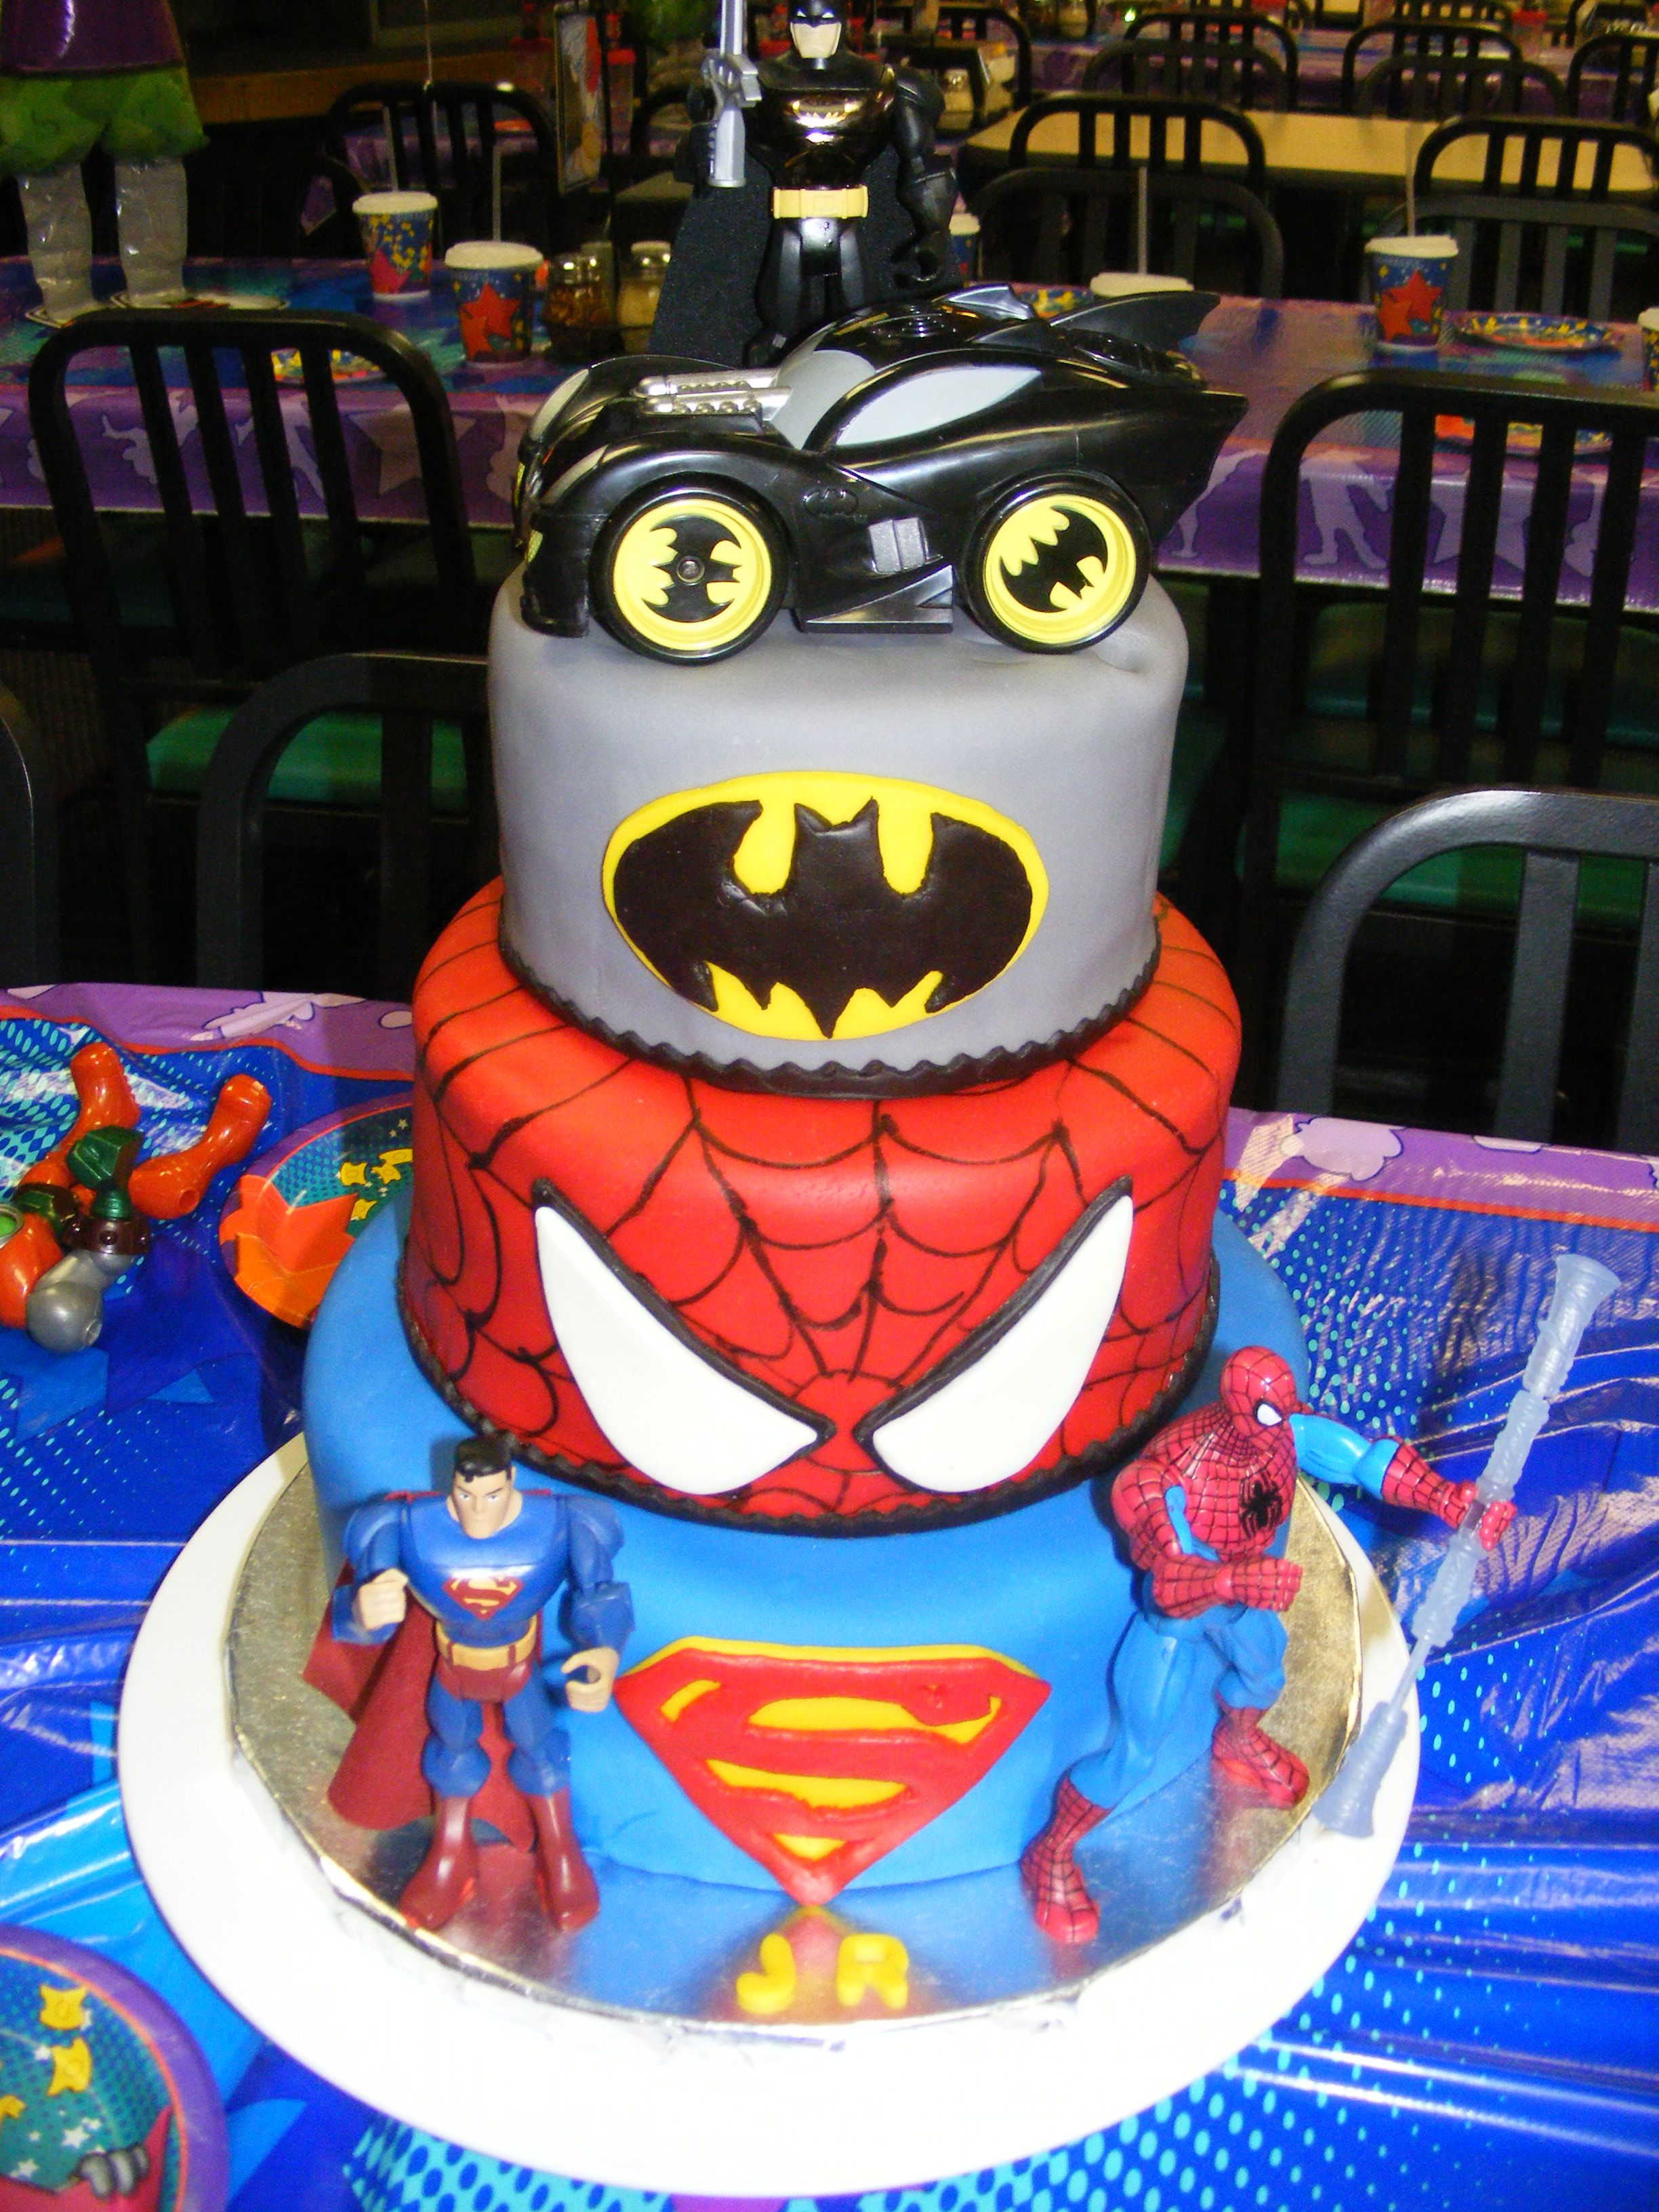 JRs Super Hero birthday cake Birthday cakes for the boys